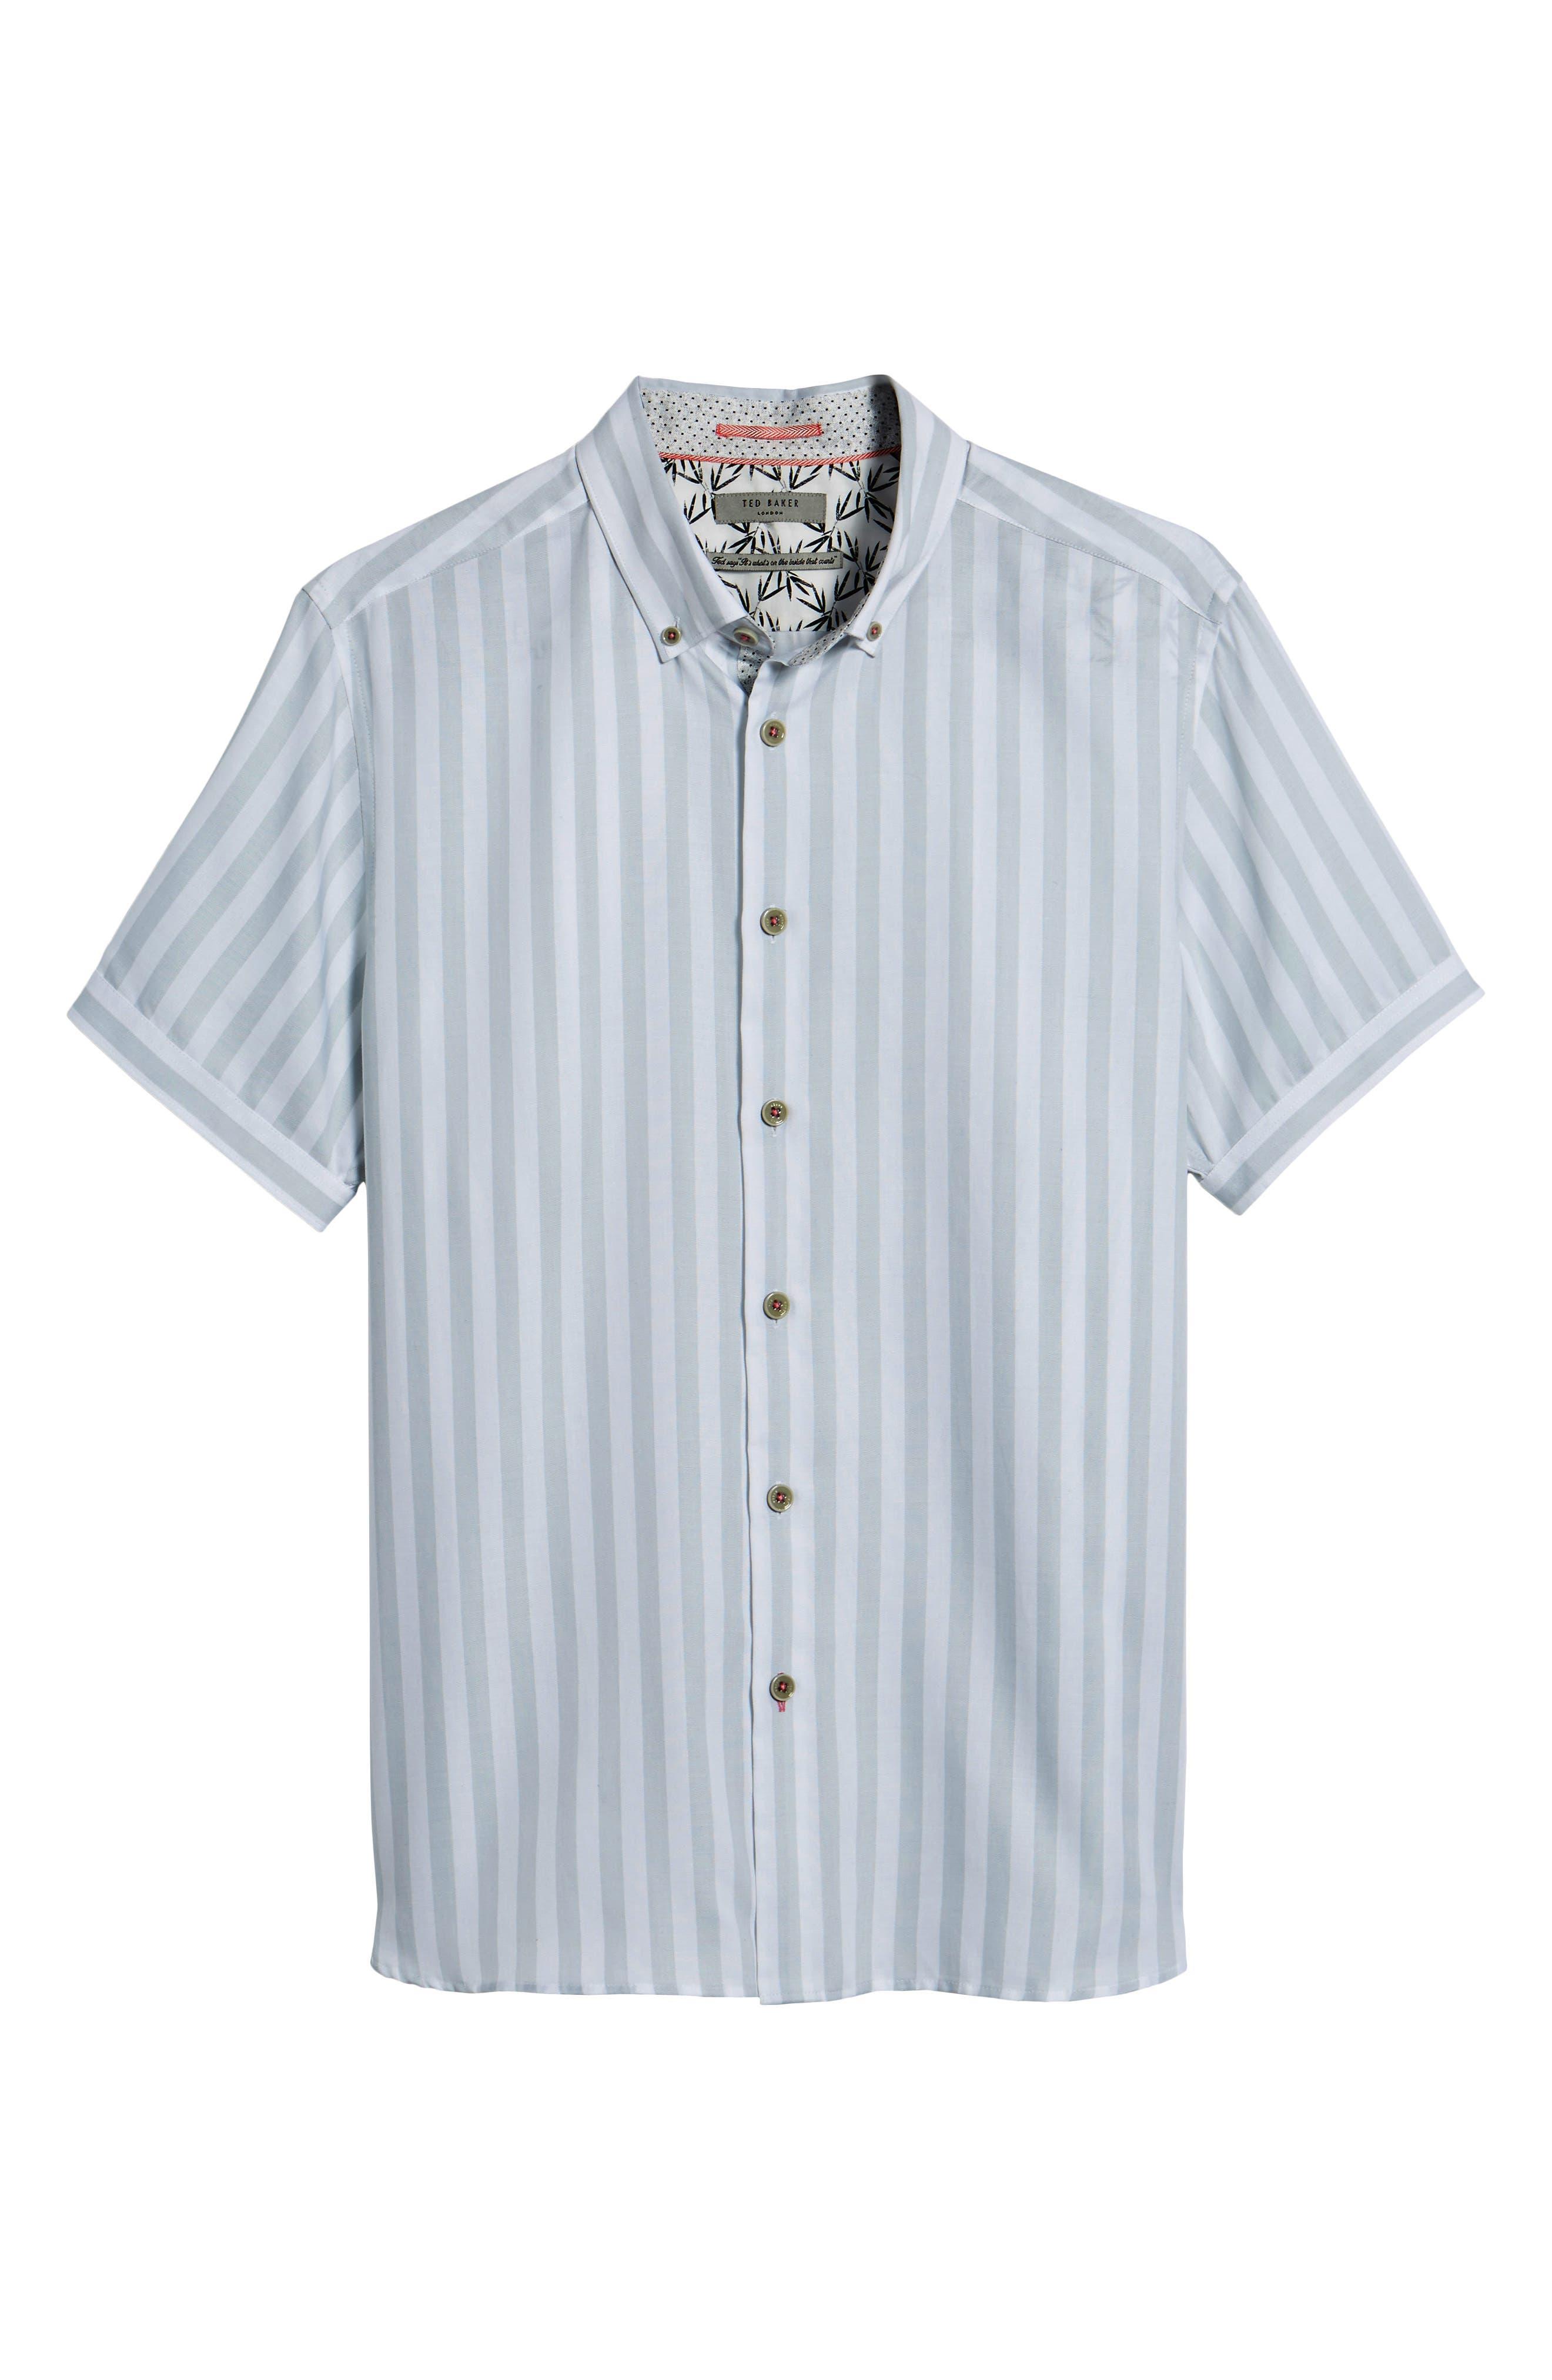 TED BAKER LONDON,                             Vertical Stripe Trim Fit Short Sleeve Sport Shirt,                             Alternate thumbnail 6, color,                             311